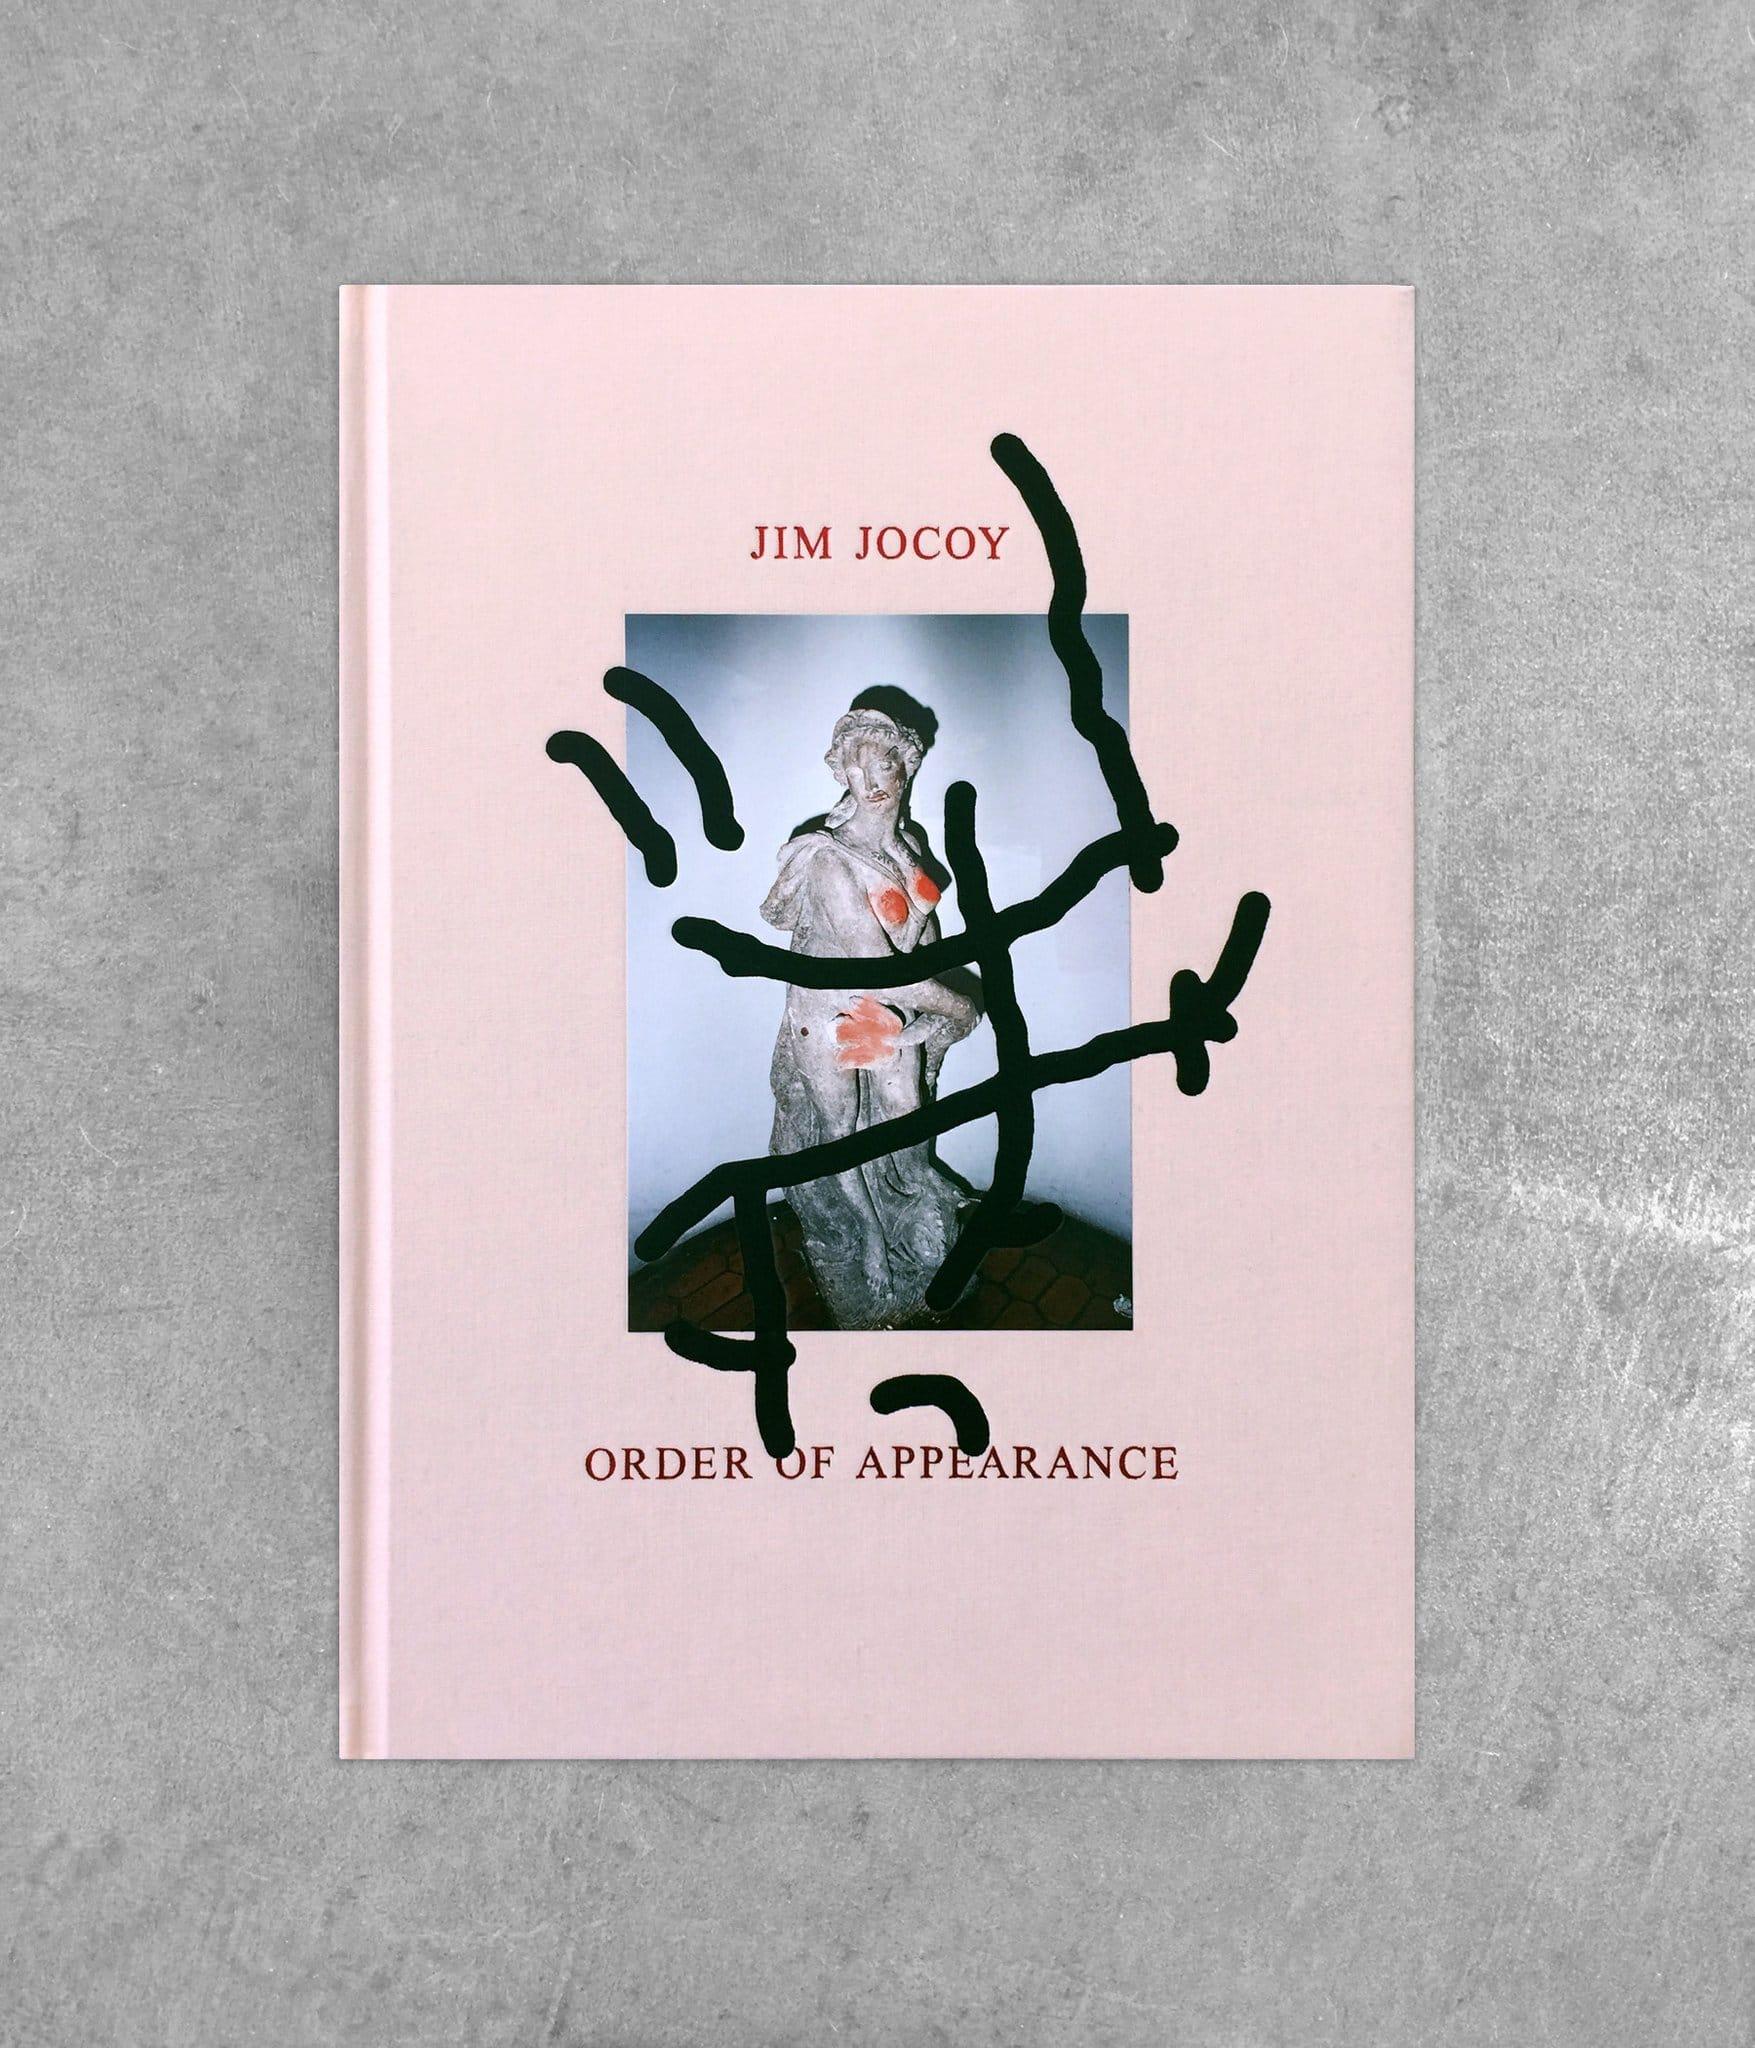 Order of Appearance by Jim Jocoy – TBW Books